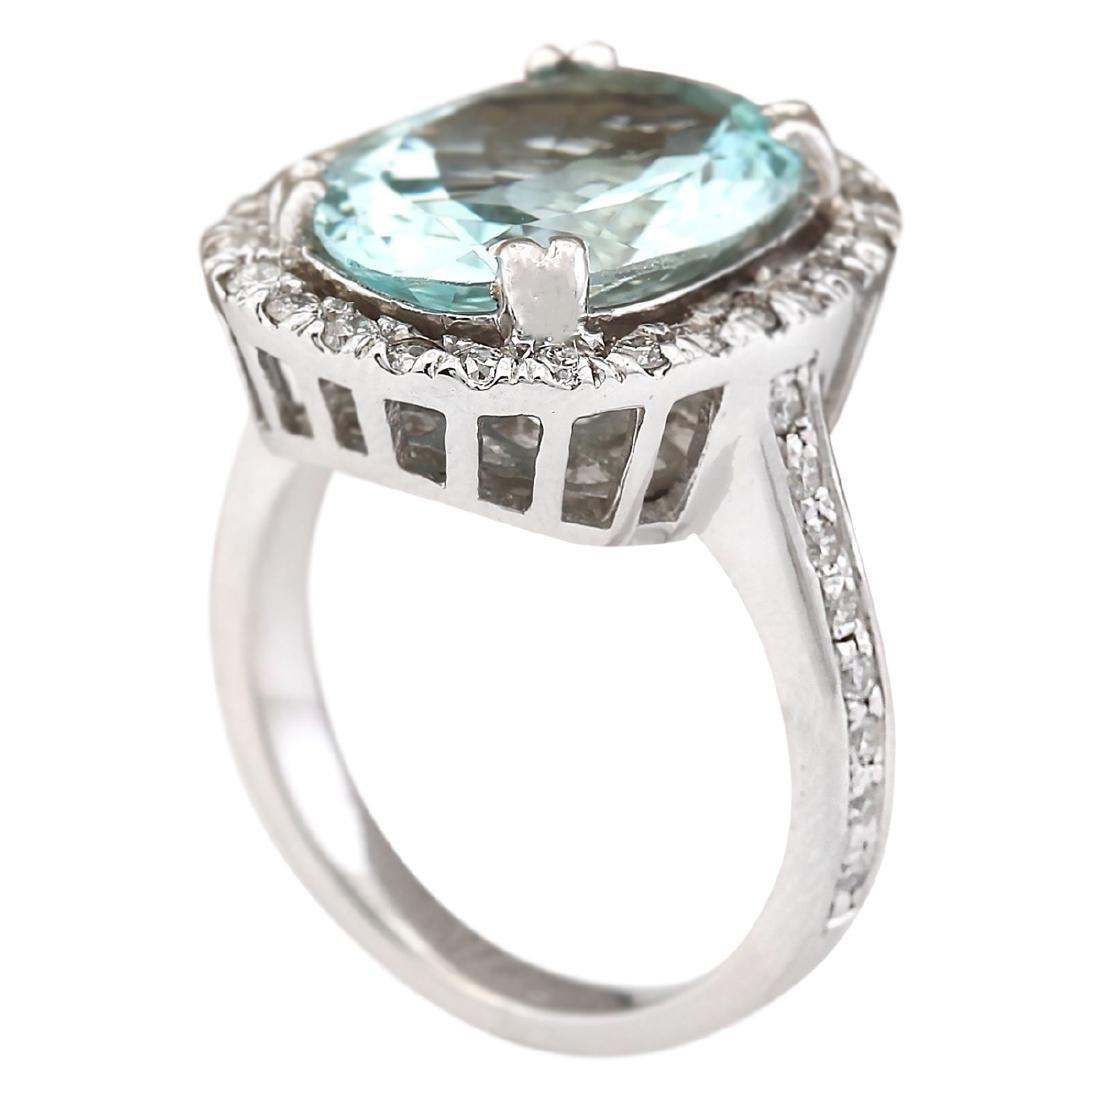 6.80 CTW Natural Aquamarine And Diamond Ring In 18K - 3